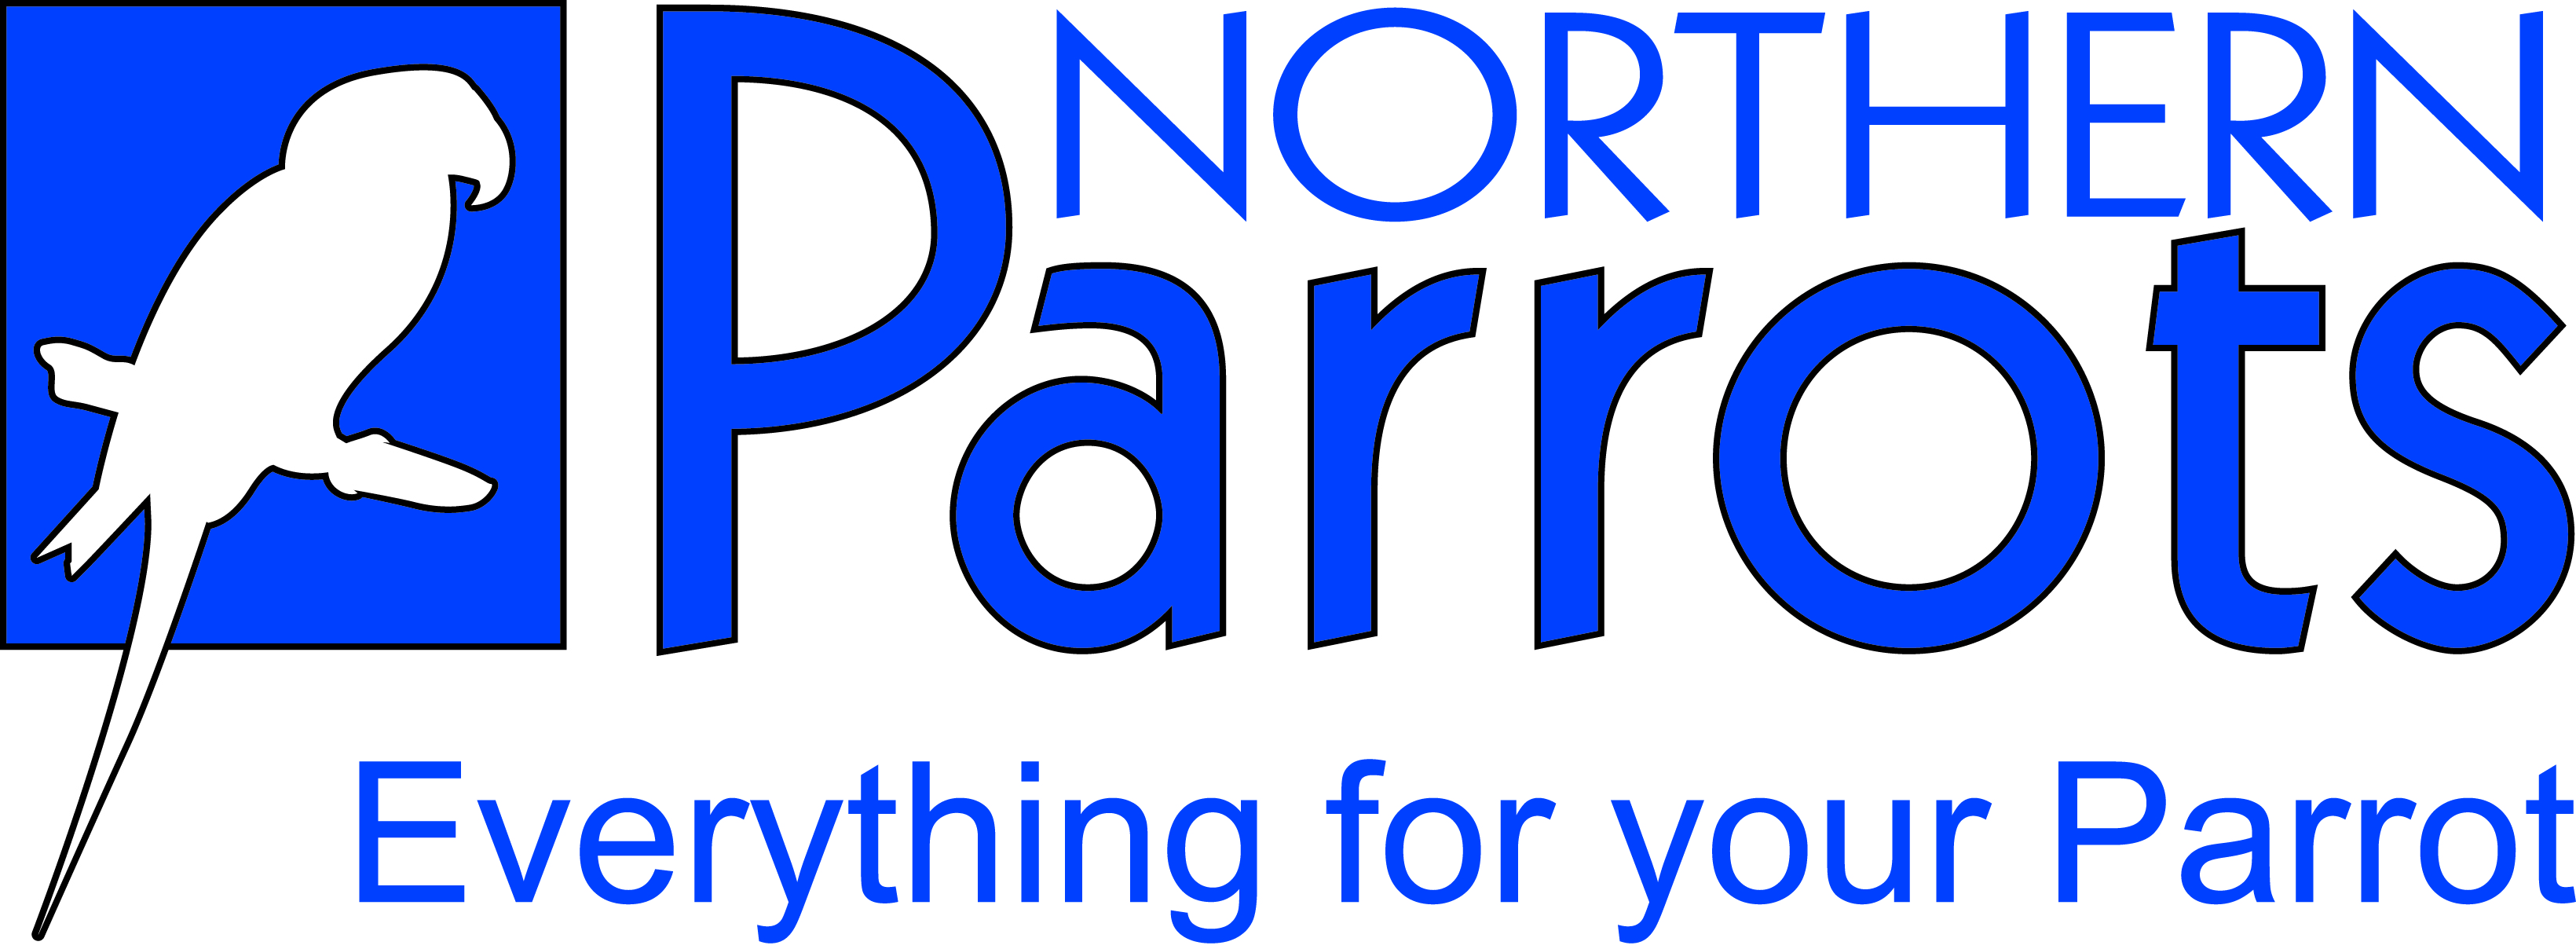 northern-parrots-logo.jpg